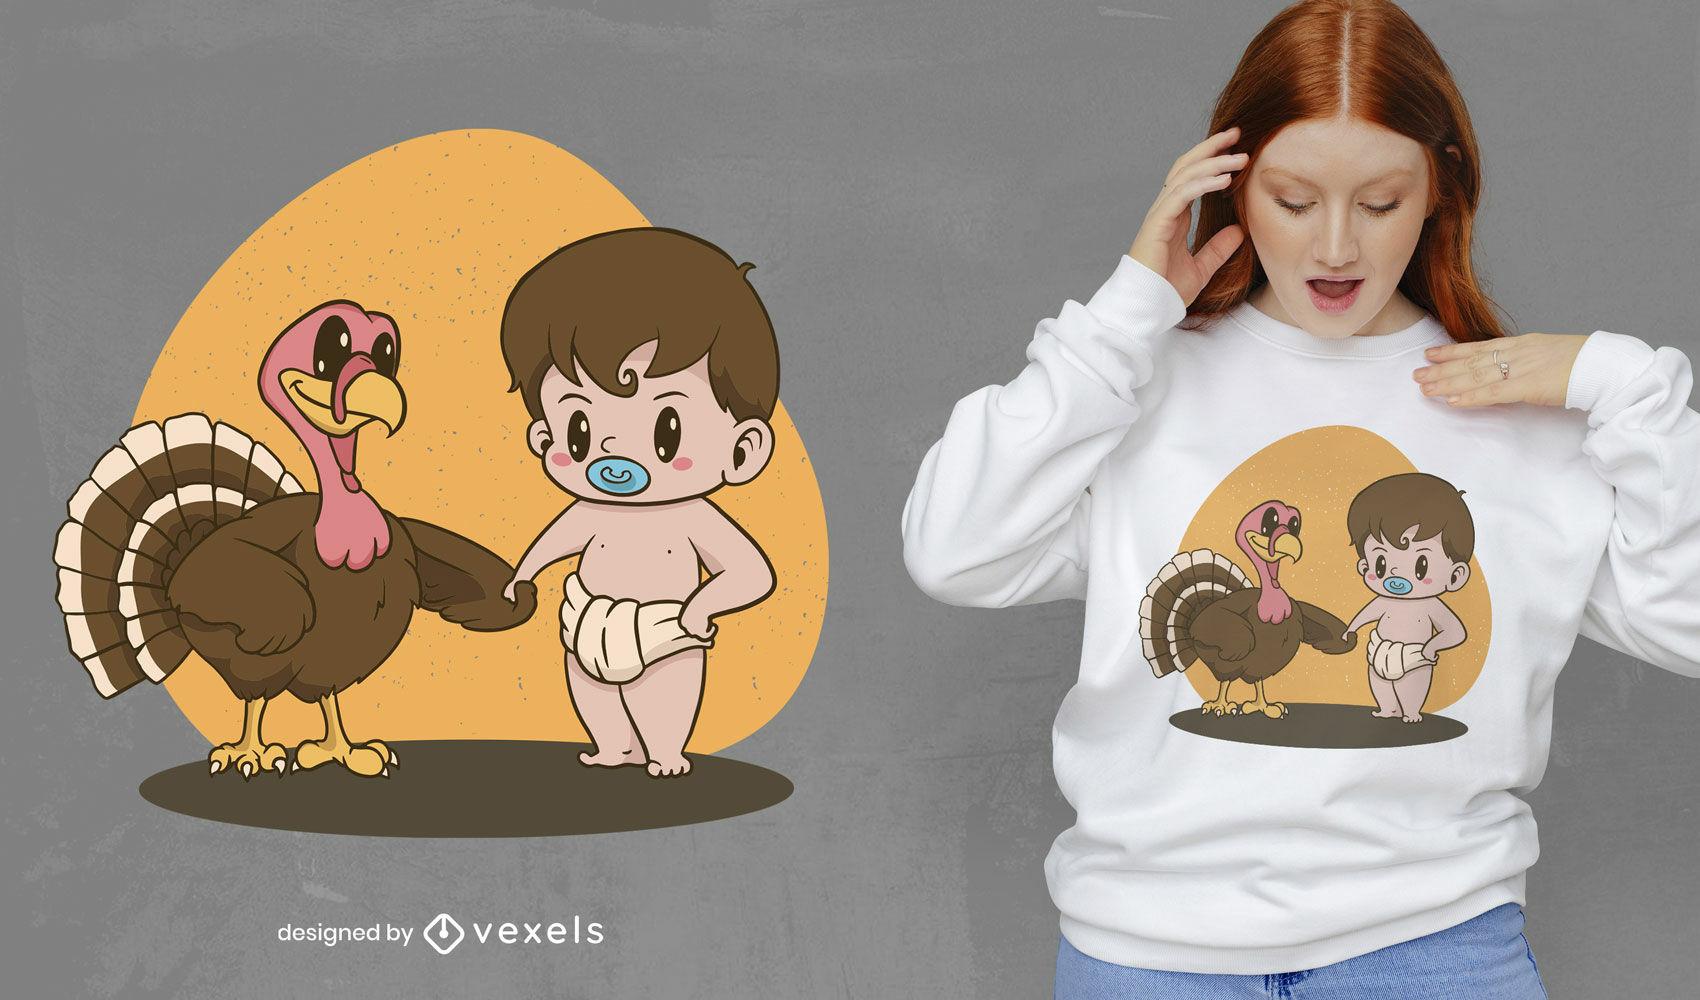 Baby and turkey t-shirt design